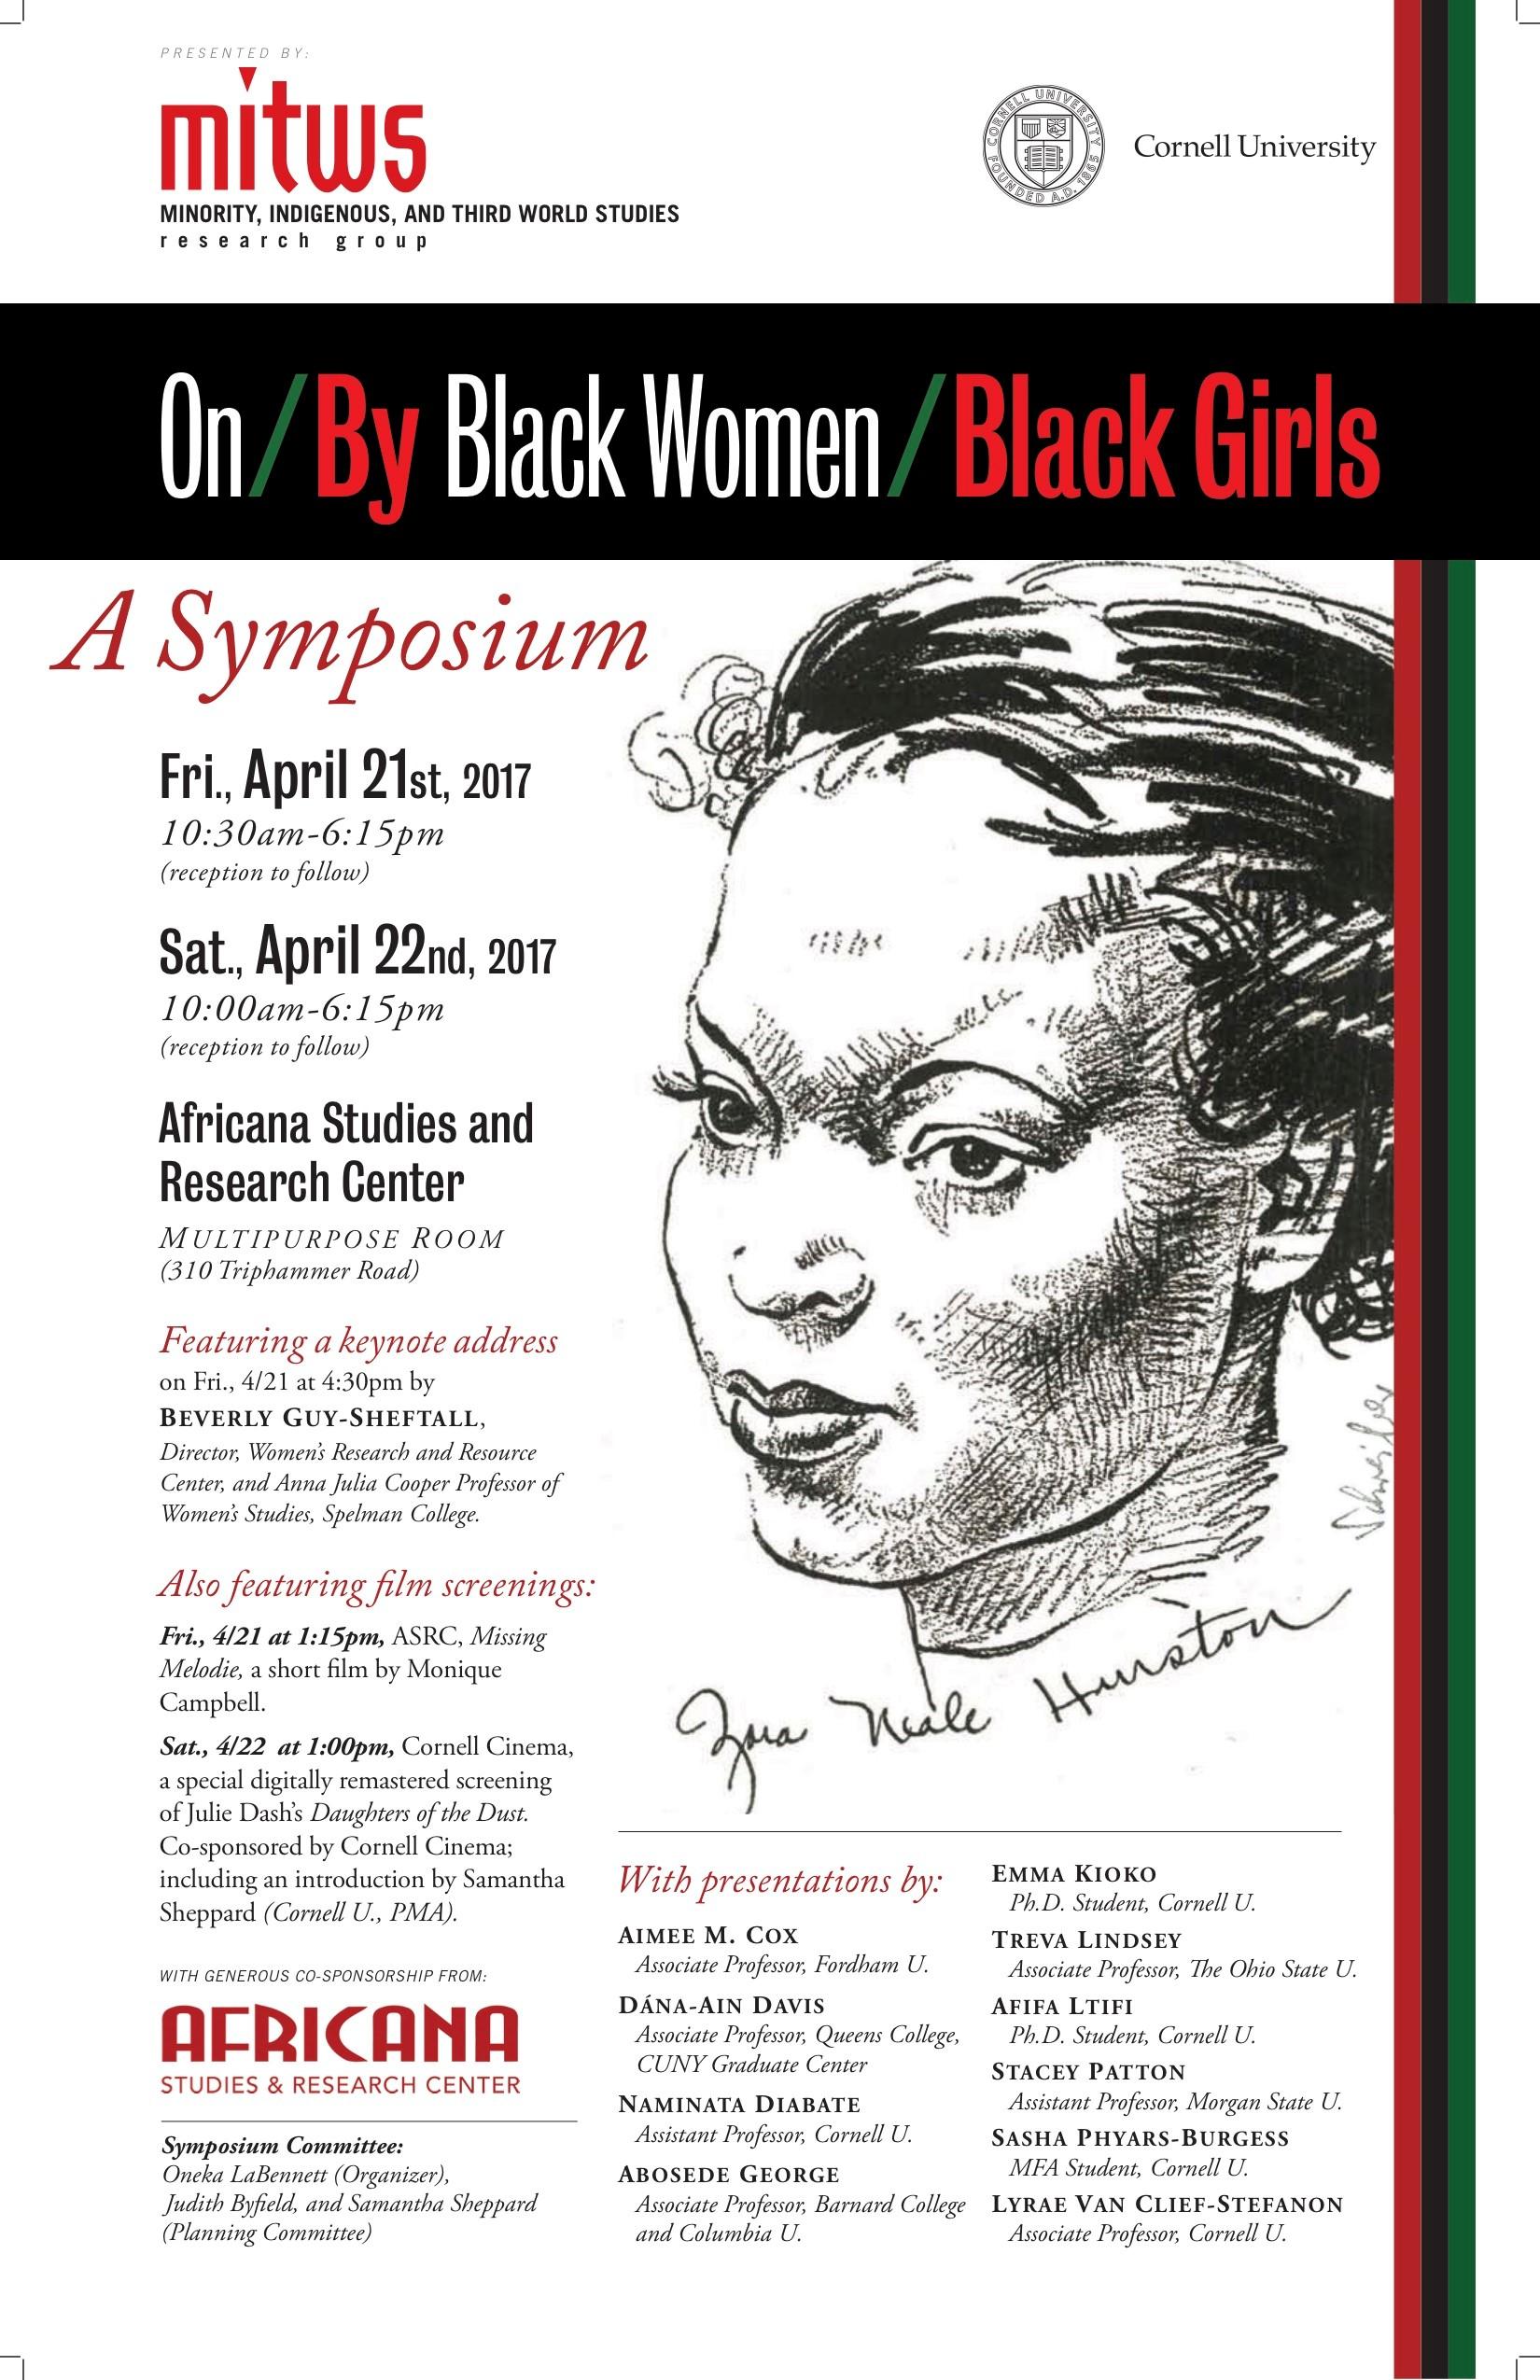 On/By Black Women/Black Girls: A Symposium